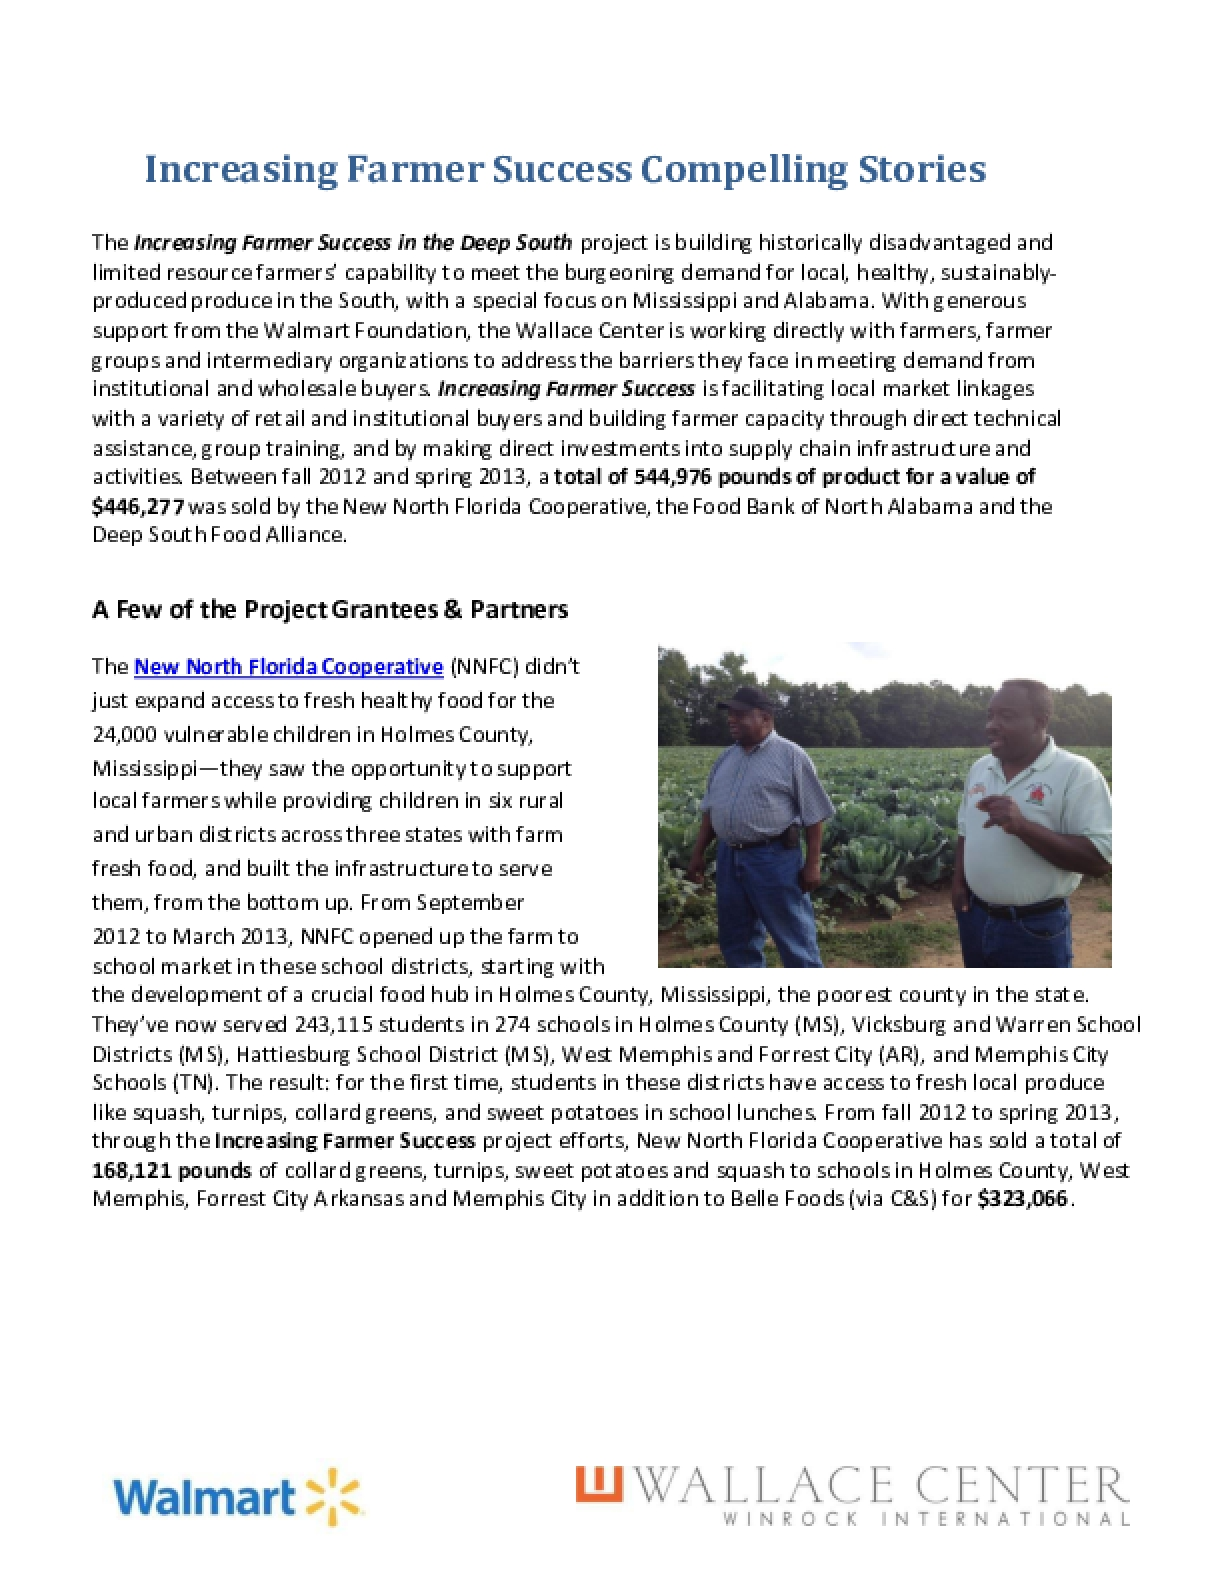 Increasing Farmer Success: Compelling Stories